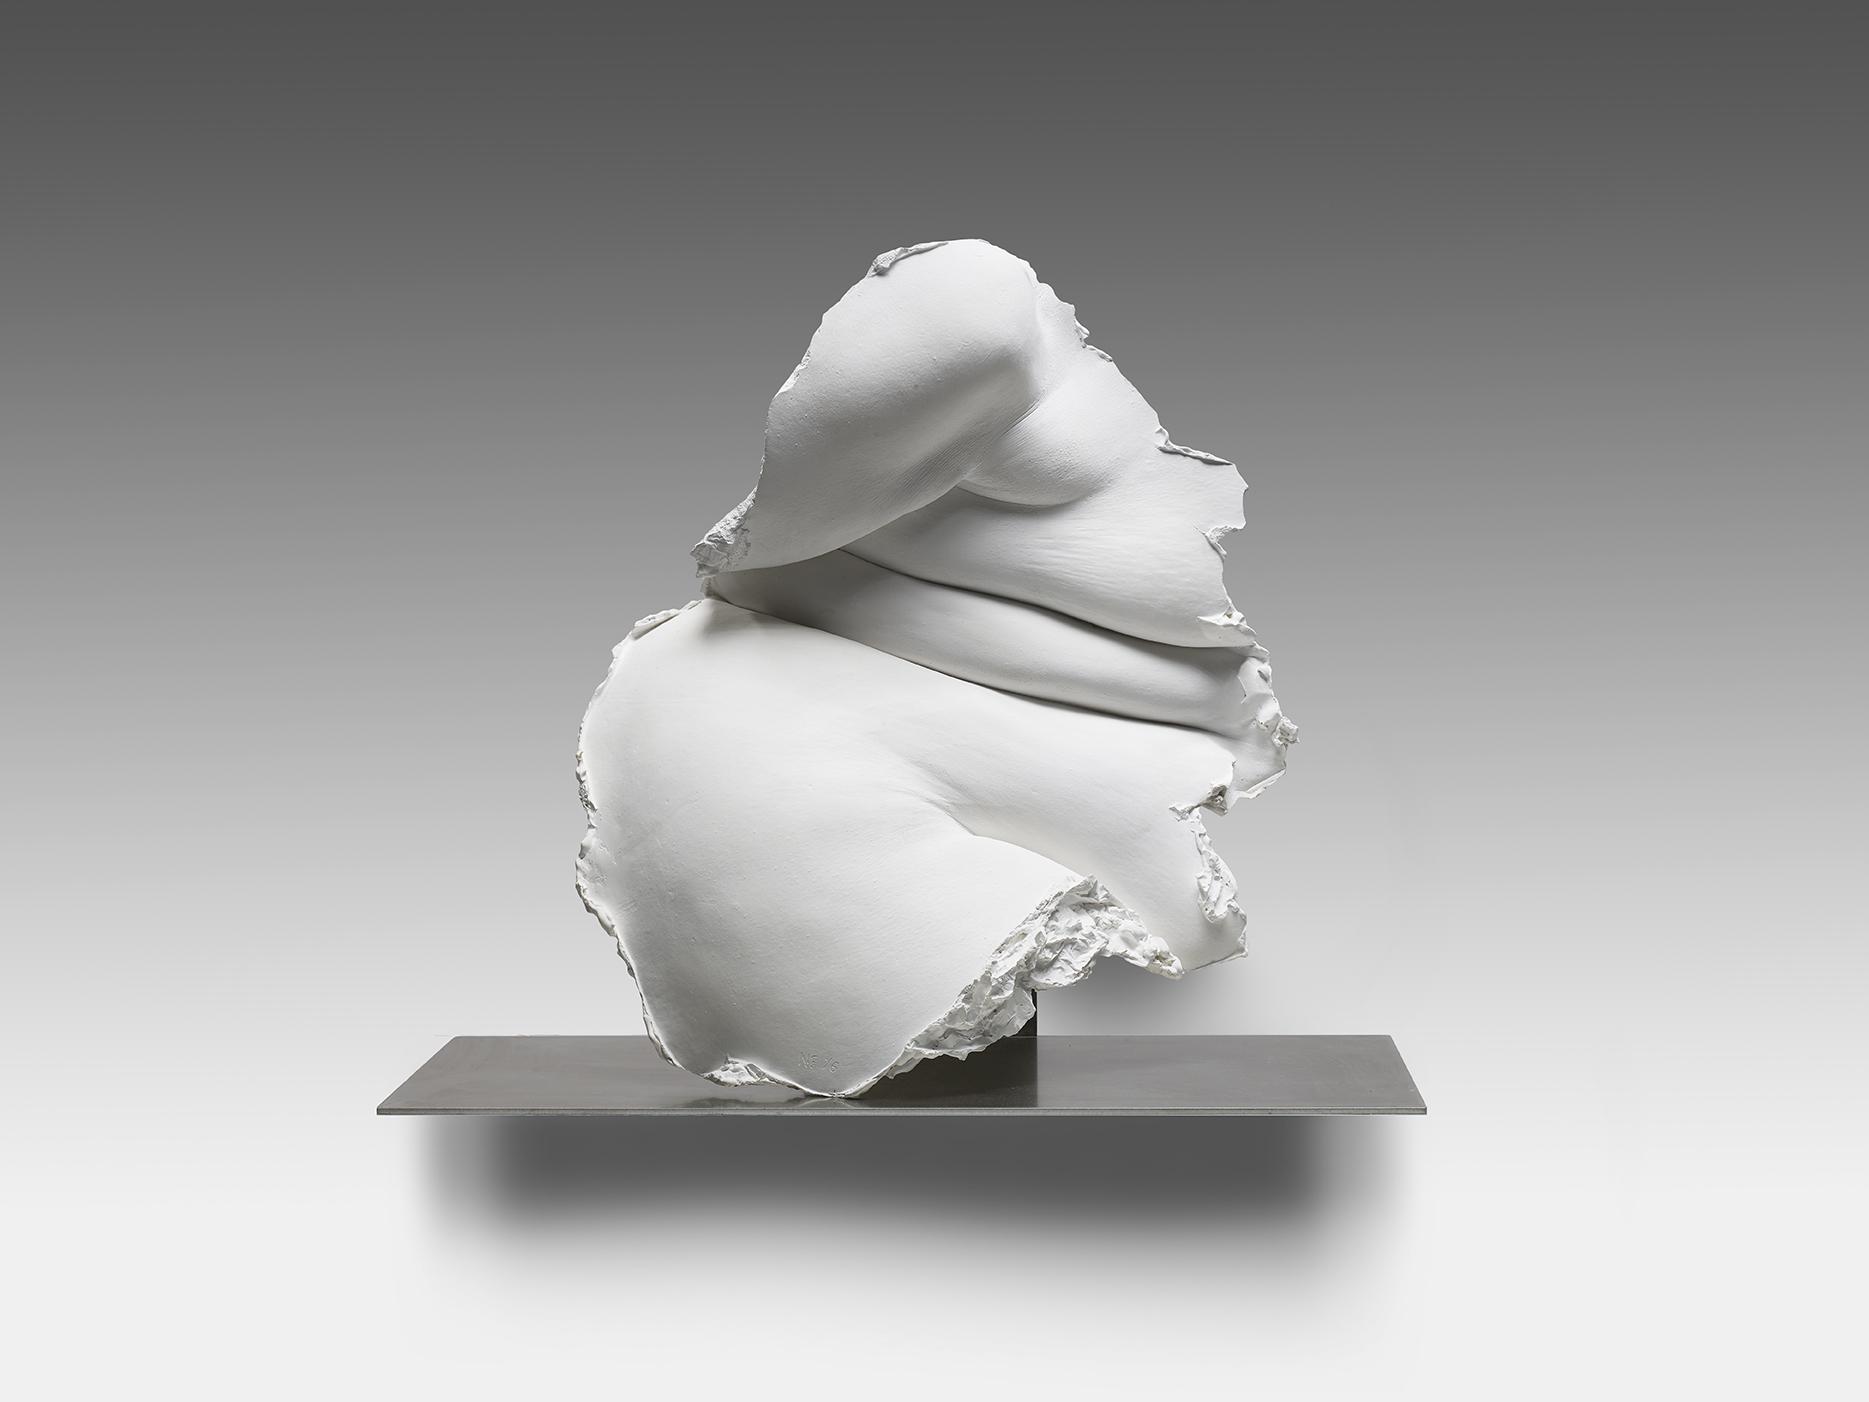 """Opis"", 2018, Jesmonite, Edition of 6, L: 61 x W: 23.5 x H: 52 cm"